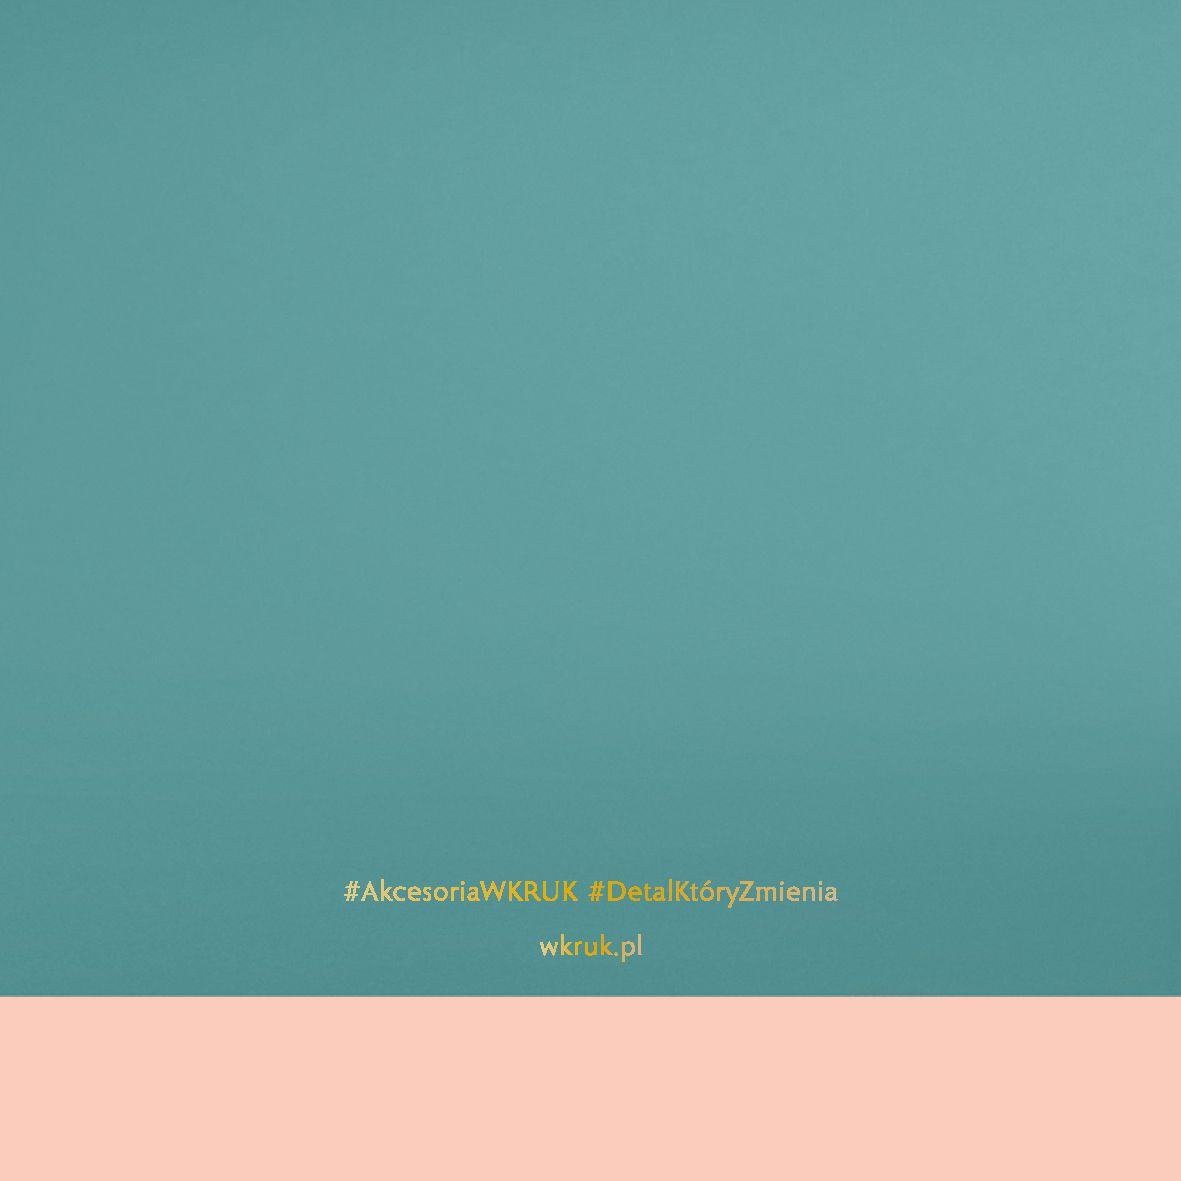 Gazetka W. KRUK: Katalog - Akcesoria 2021-02-17 page-94